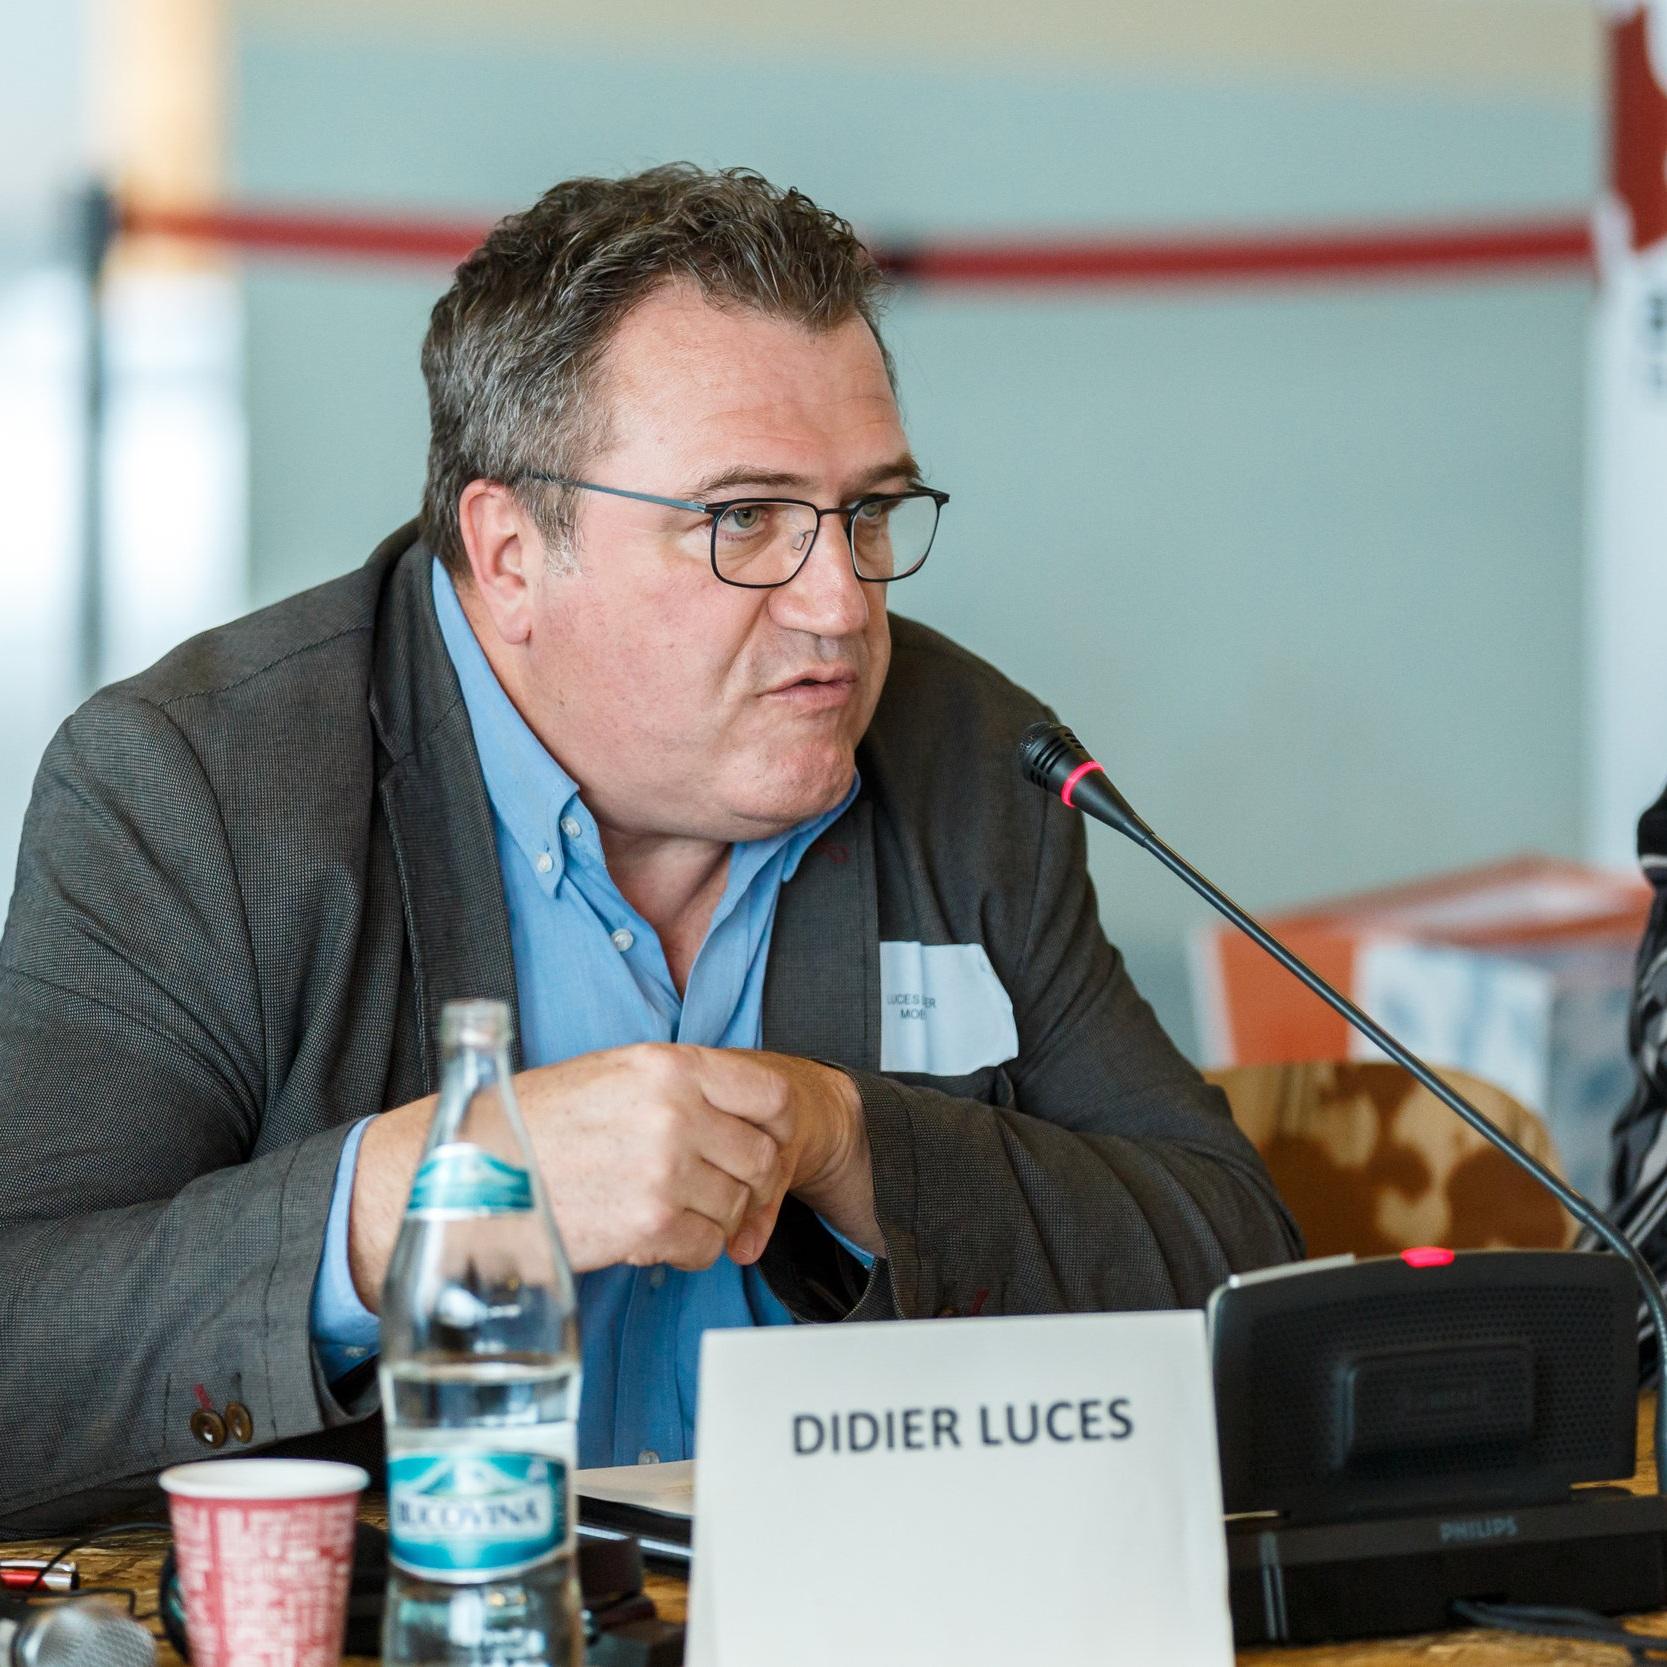 Didier LUCES  Director, Reteaua Mob'In Franta   Pentru o mobilitate incluziva